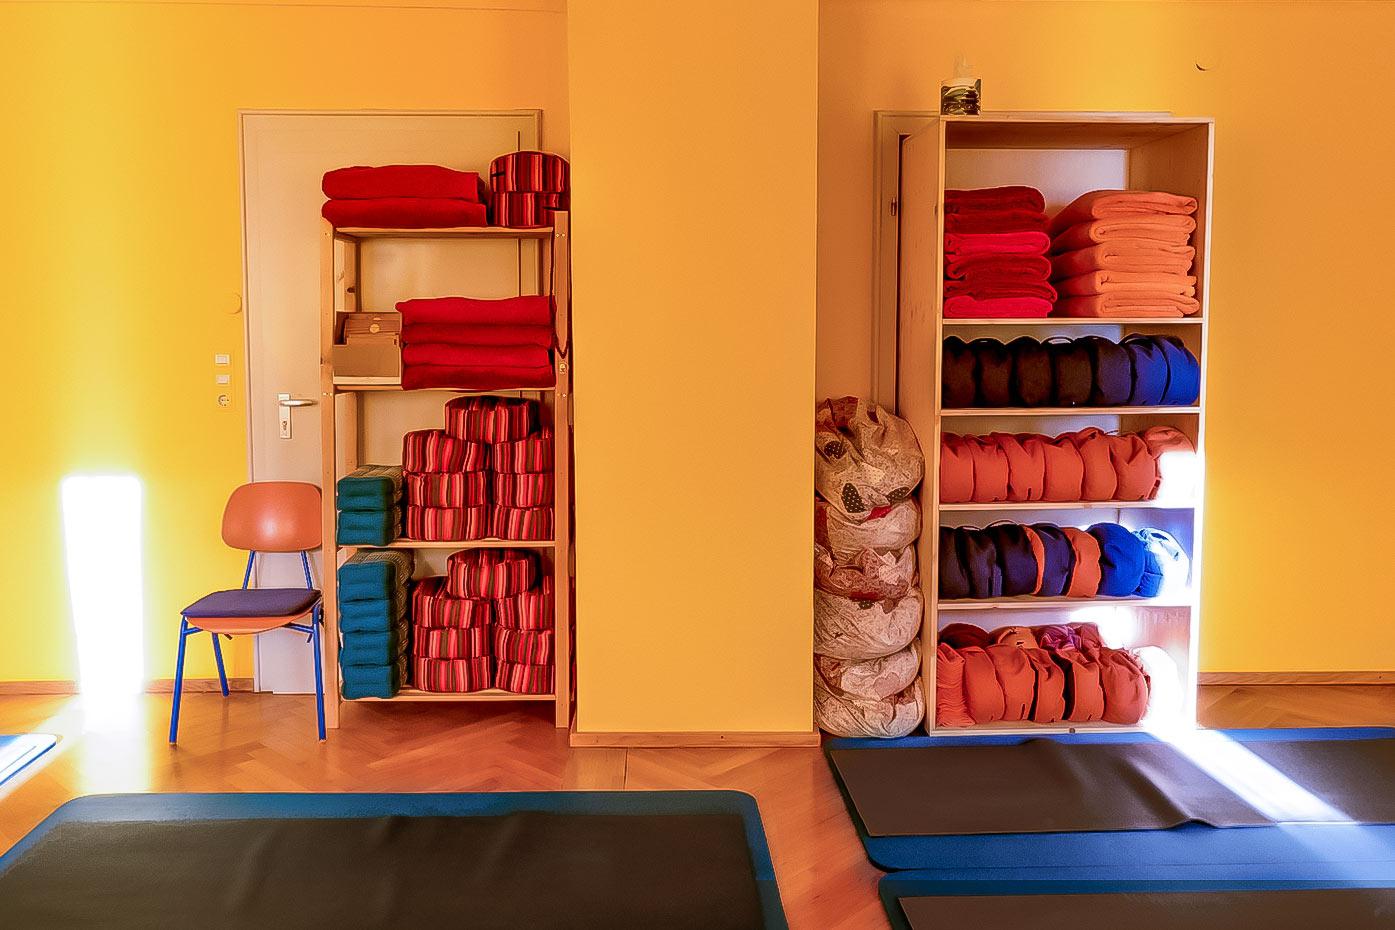 Yogakissen, Yogadecken & Yogamatten